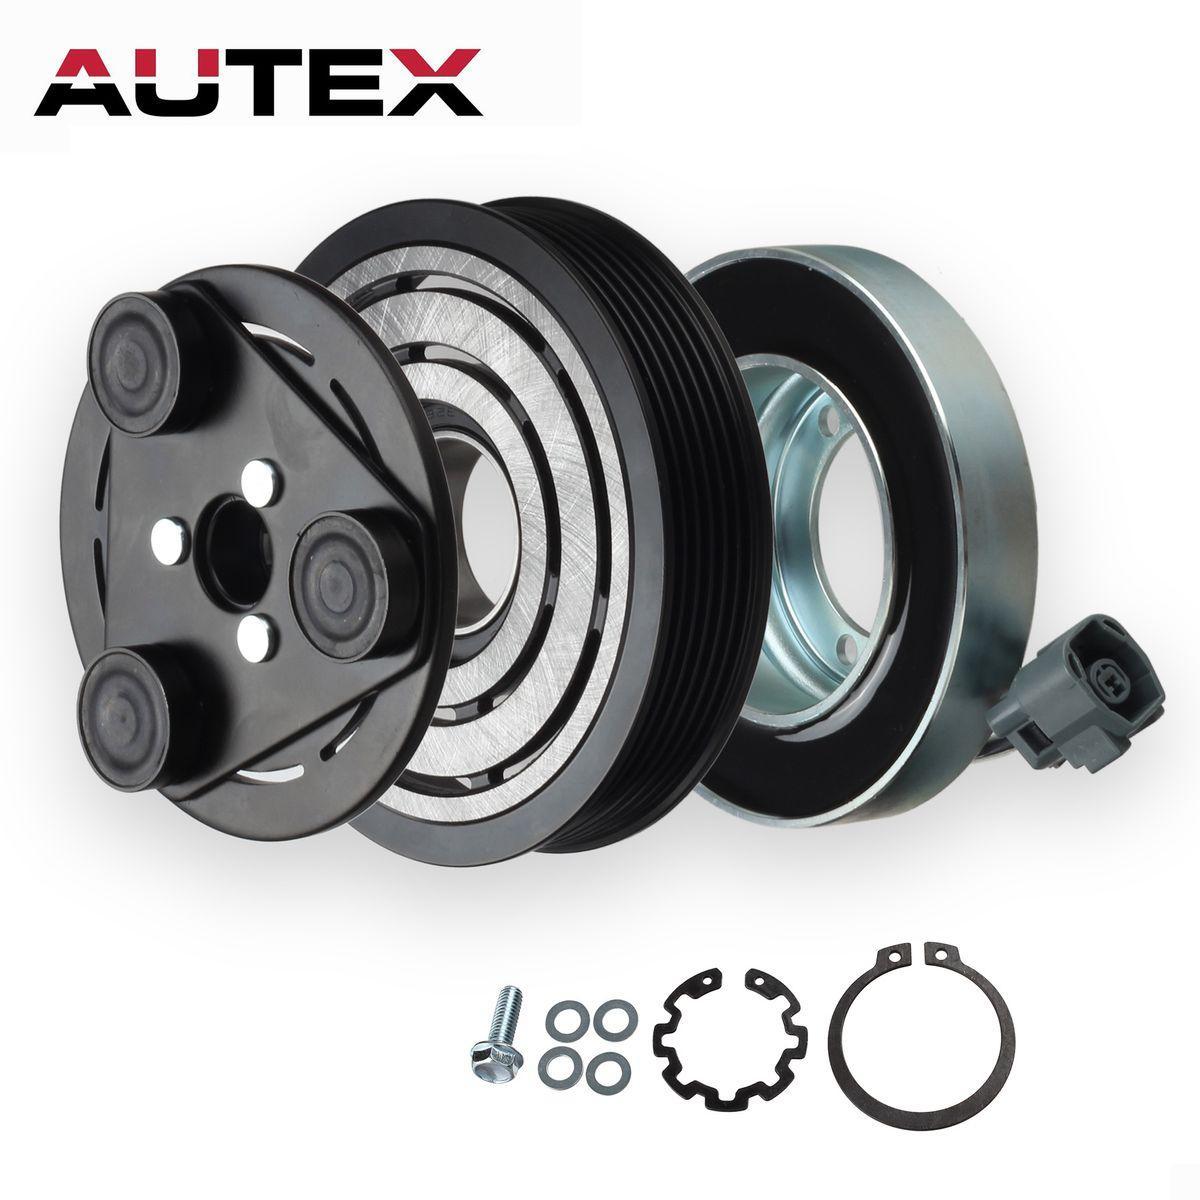 Ac Compressor Clutch Kit For Mazda 3 Turbo 07